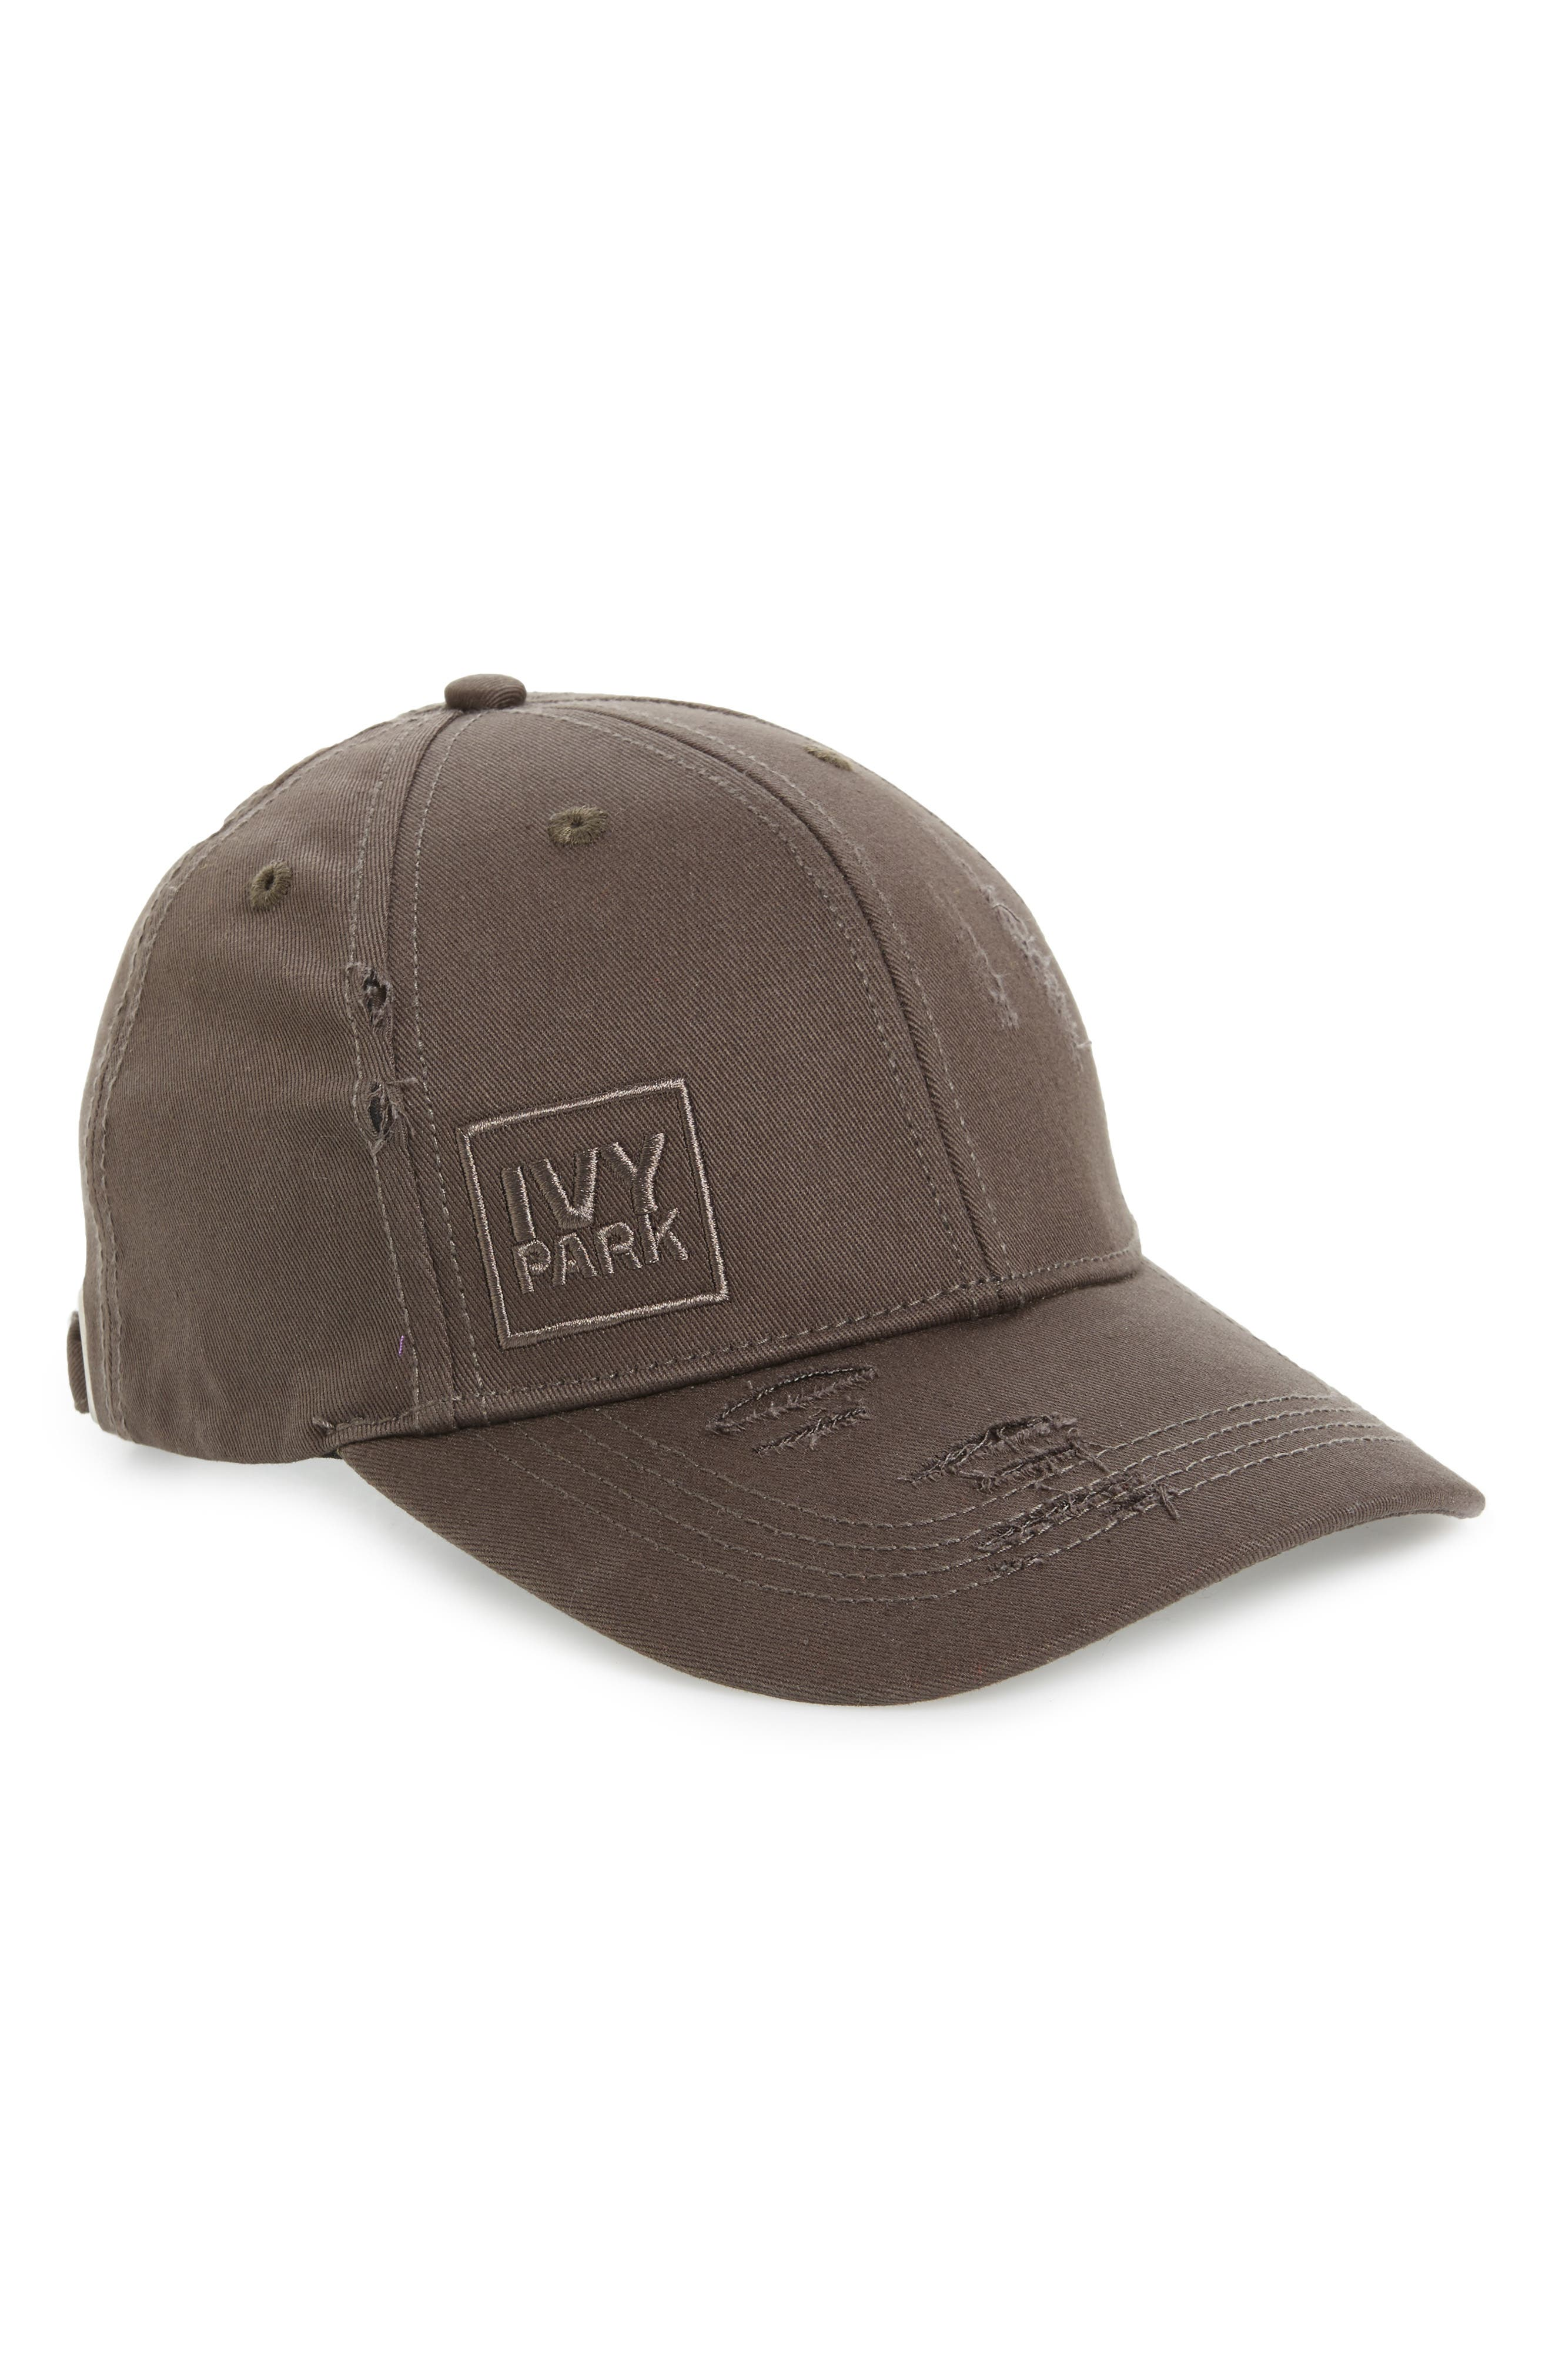 Main Image - IVY PARK® Distressed Baseball Cap